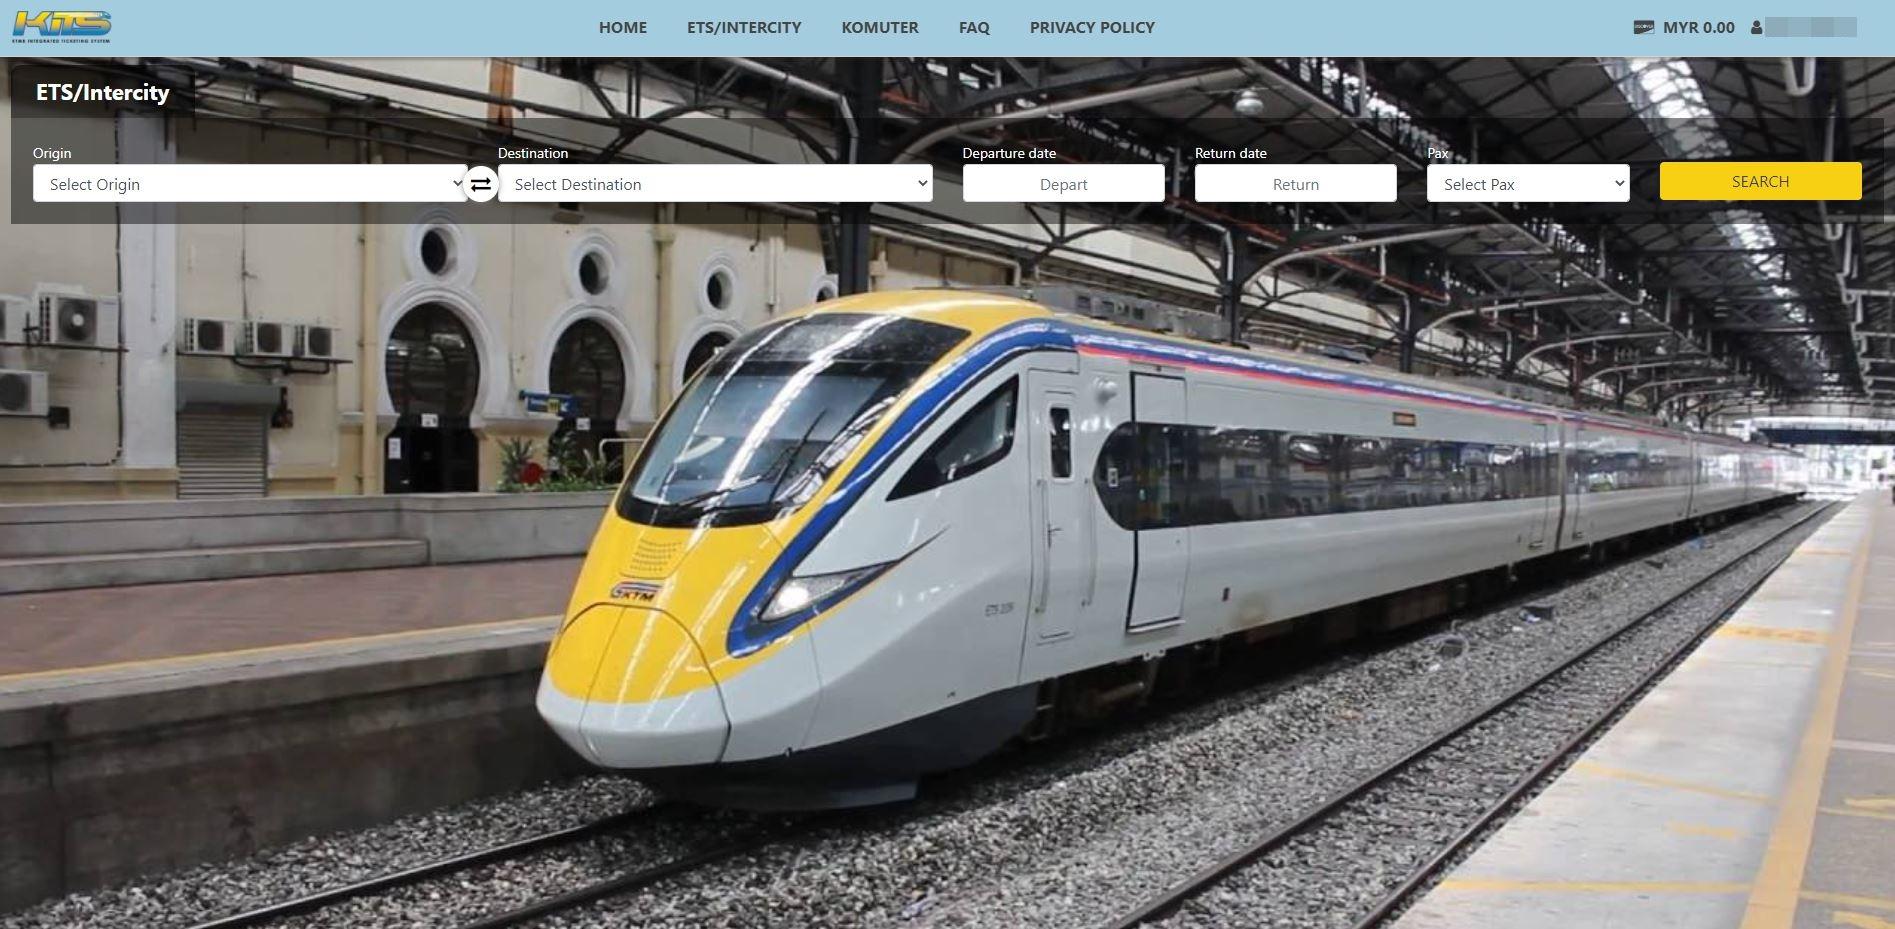 KITS KTMB ETS Train Ticket Official Website